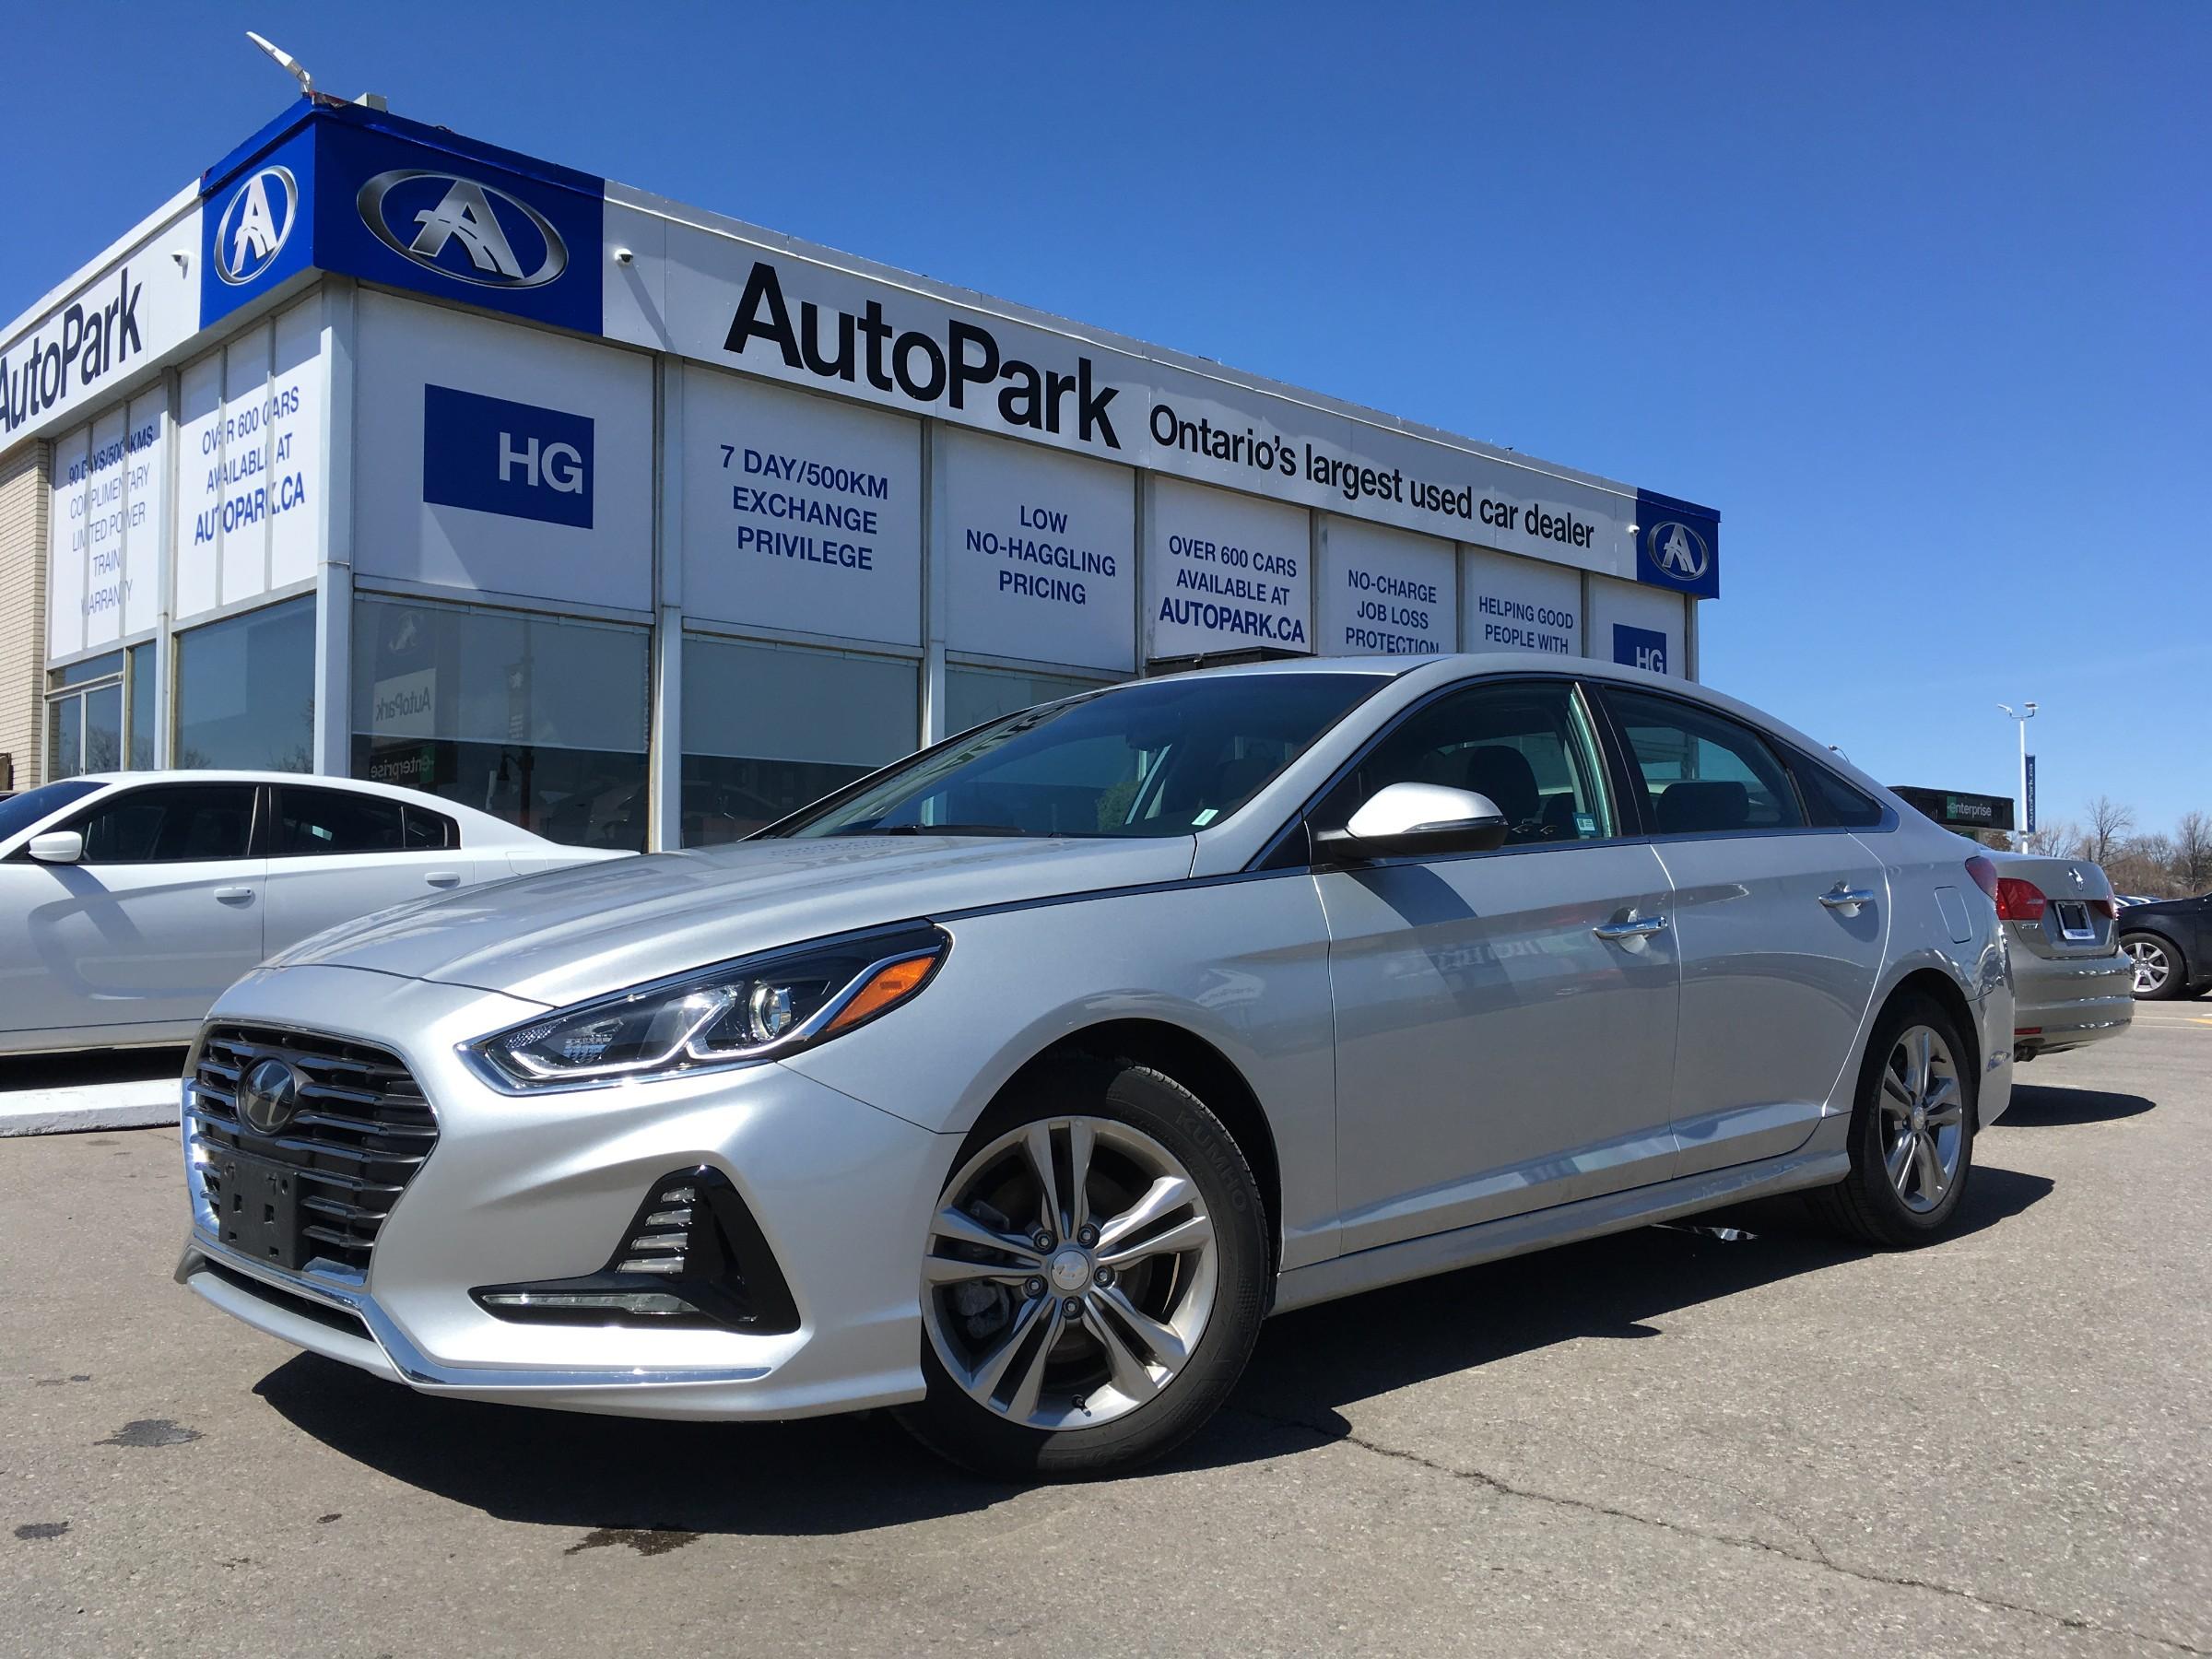 2017 Hyundai Sonata For Sale in Toronto, ON - CarGurus